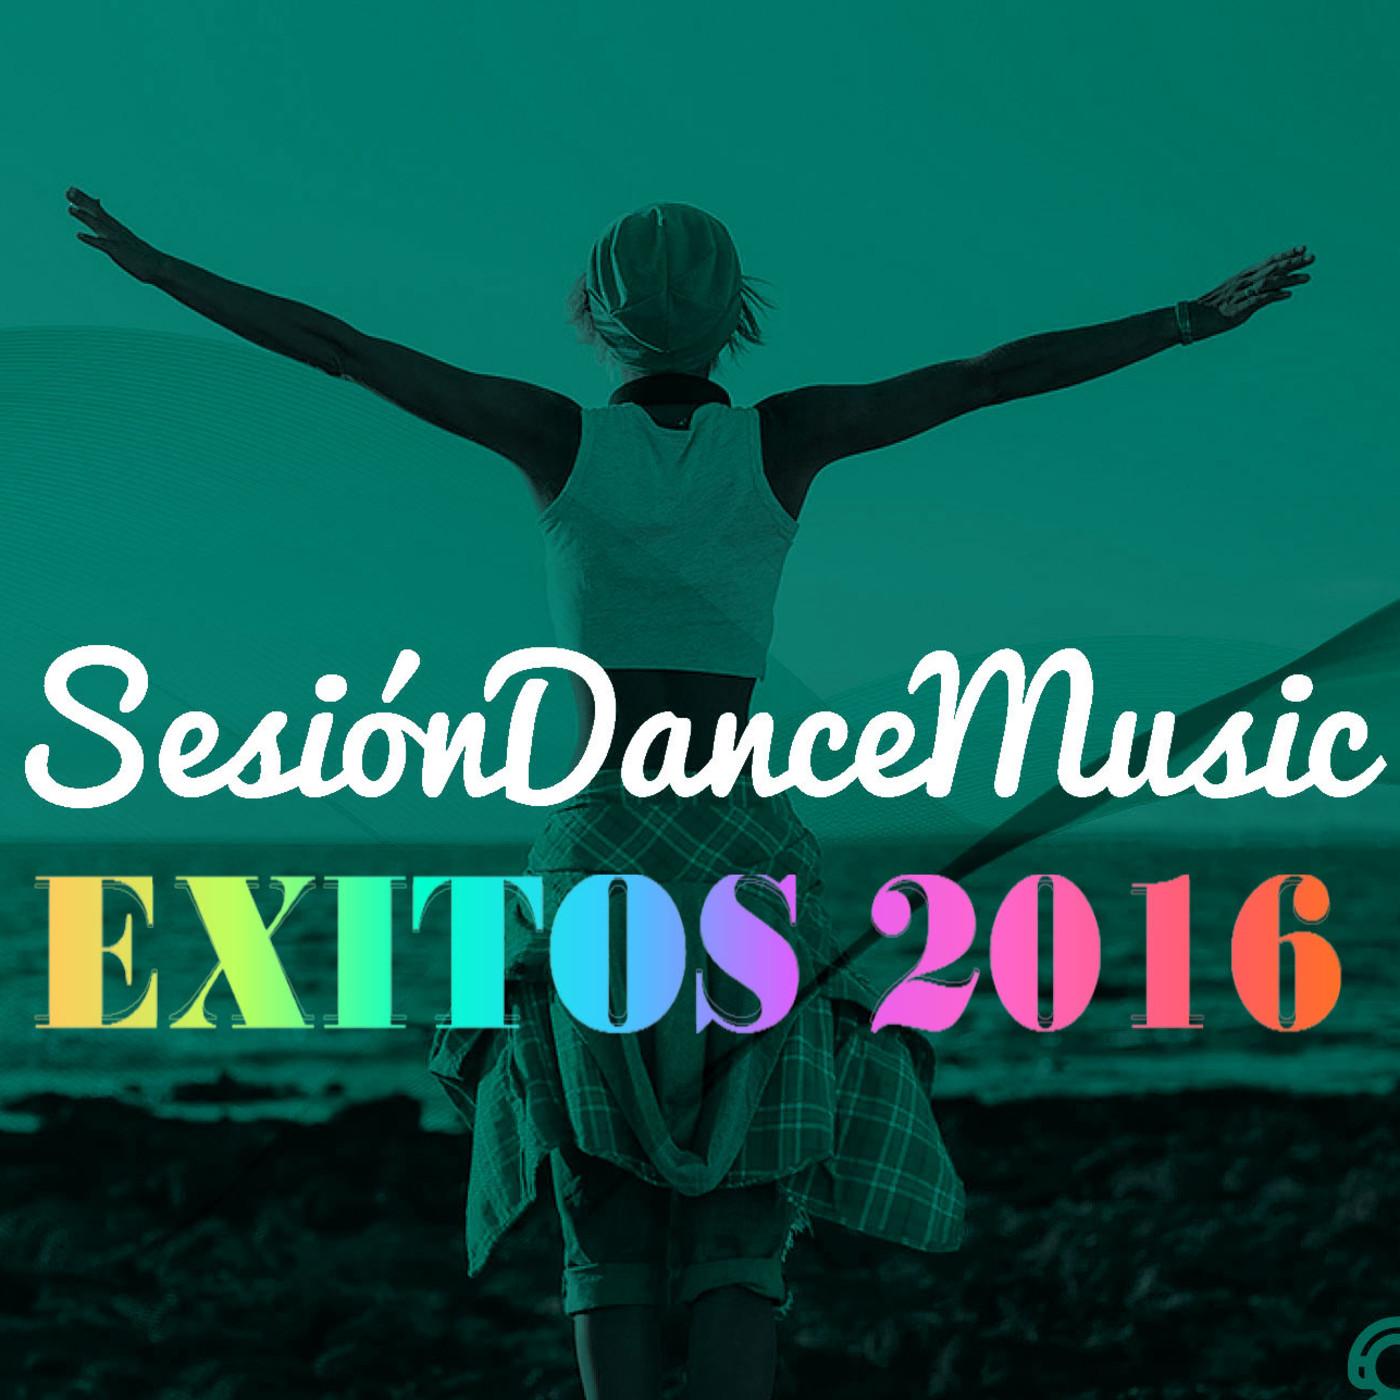 Sesion Dance Music - EXITOS 2016